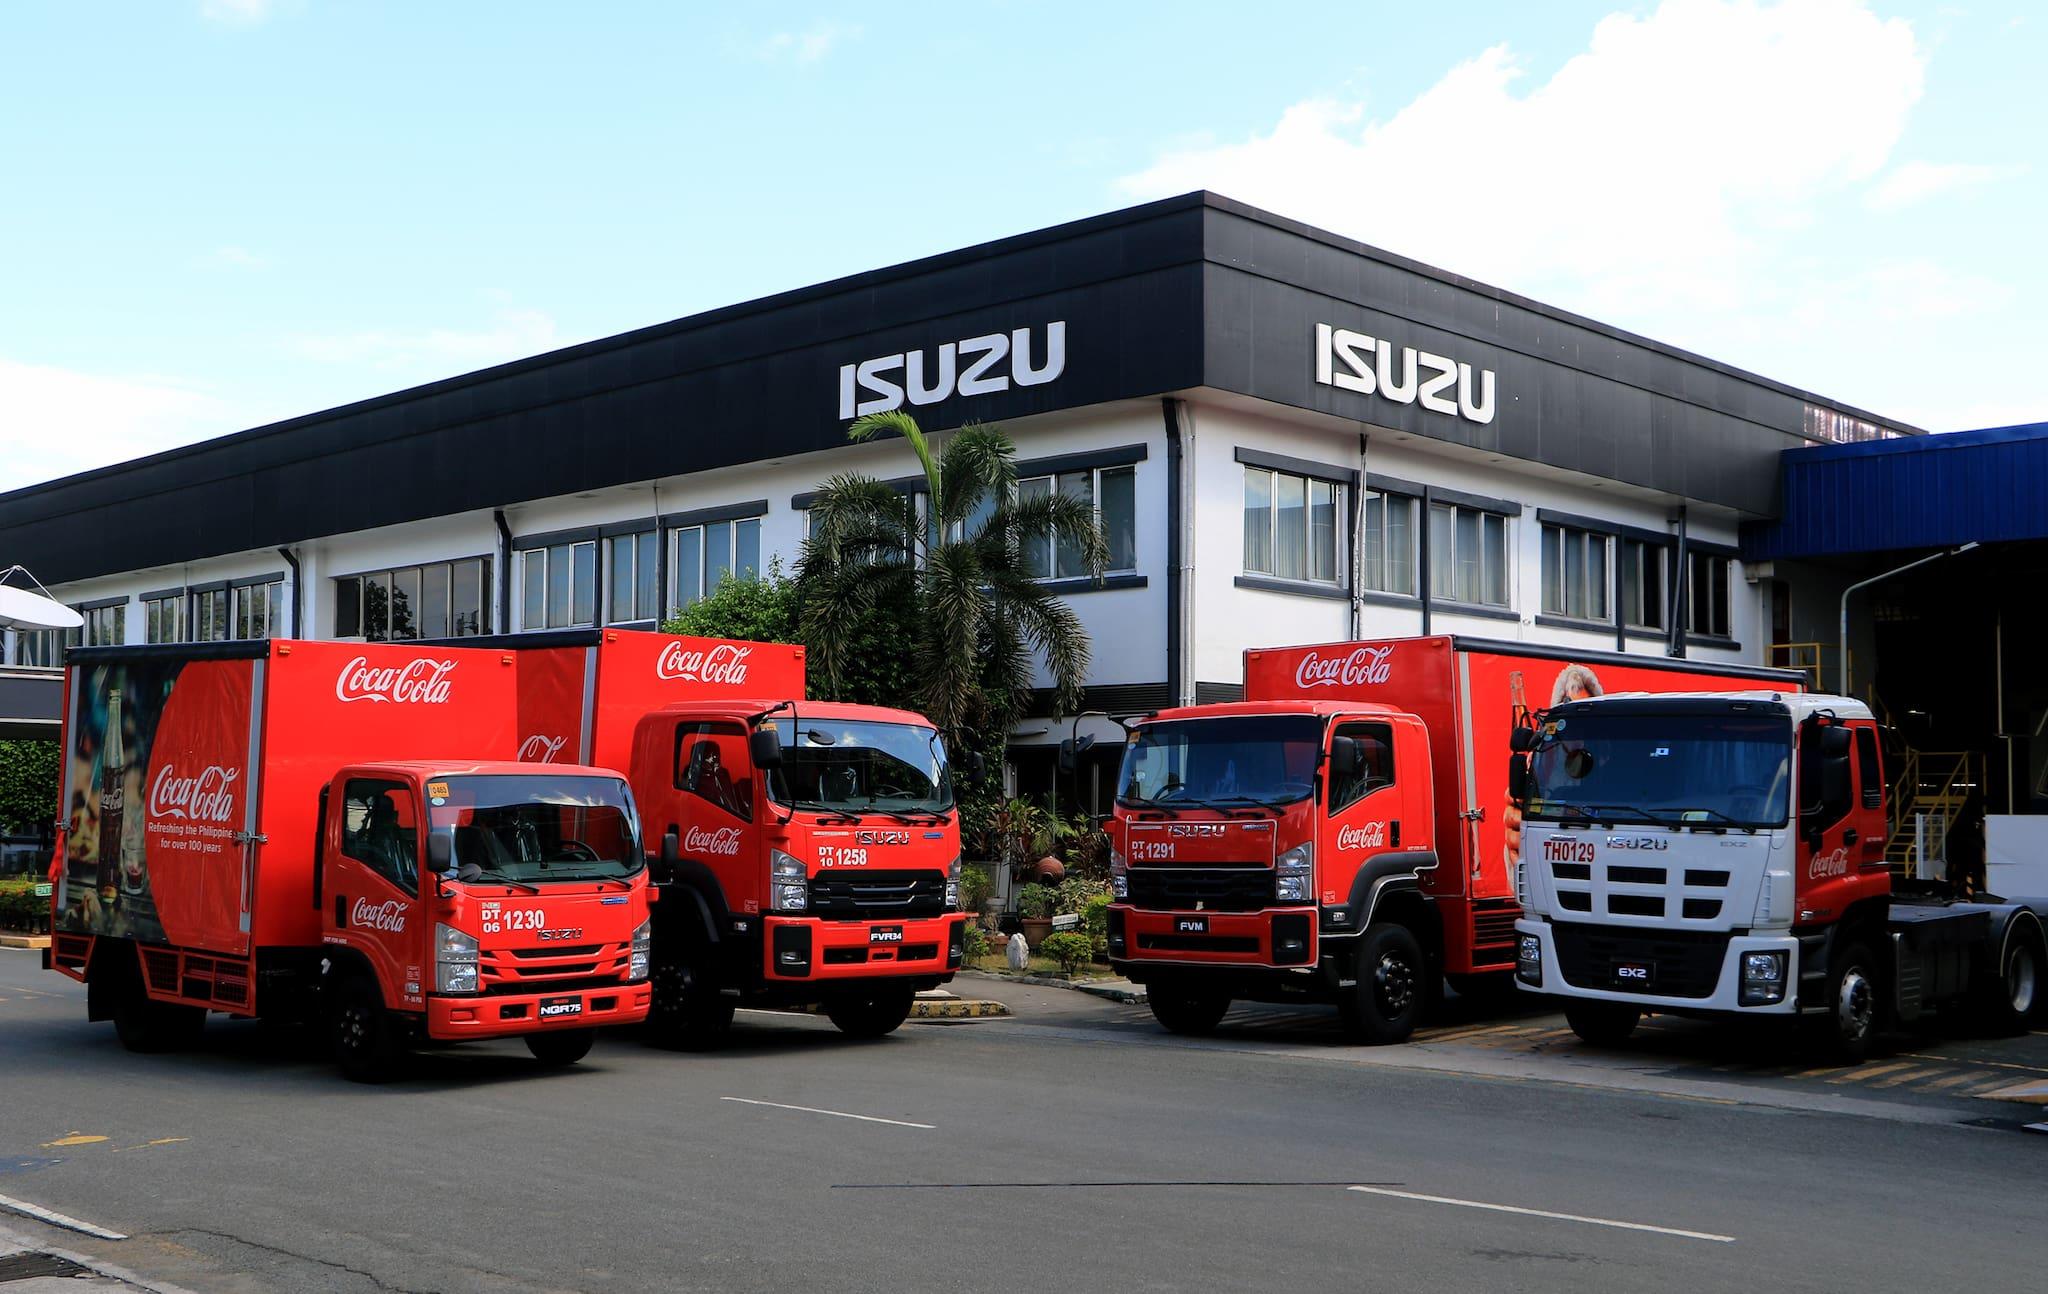 Isuzu PH inks strong partnership with Coca-Cola, provides additional truck fleet